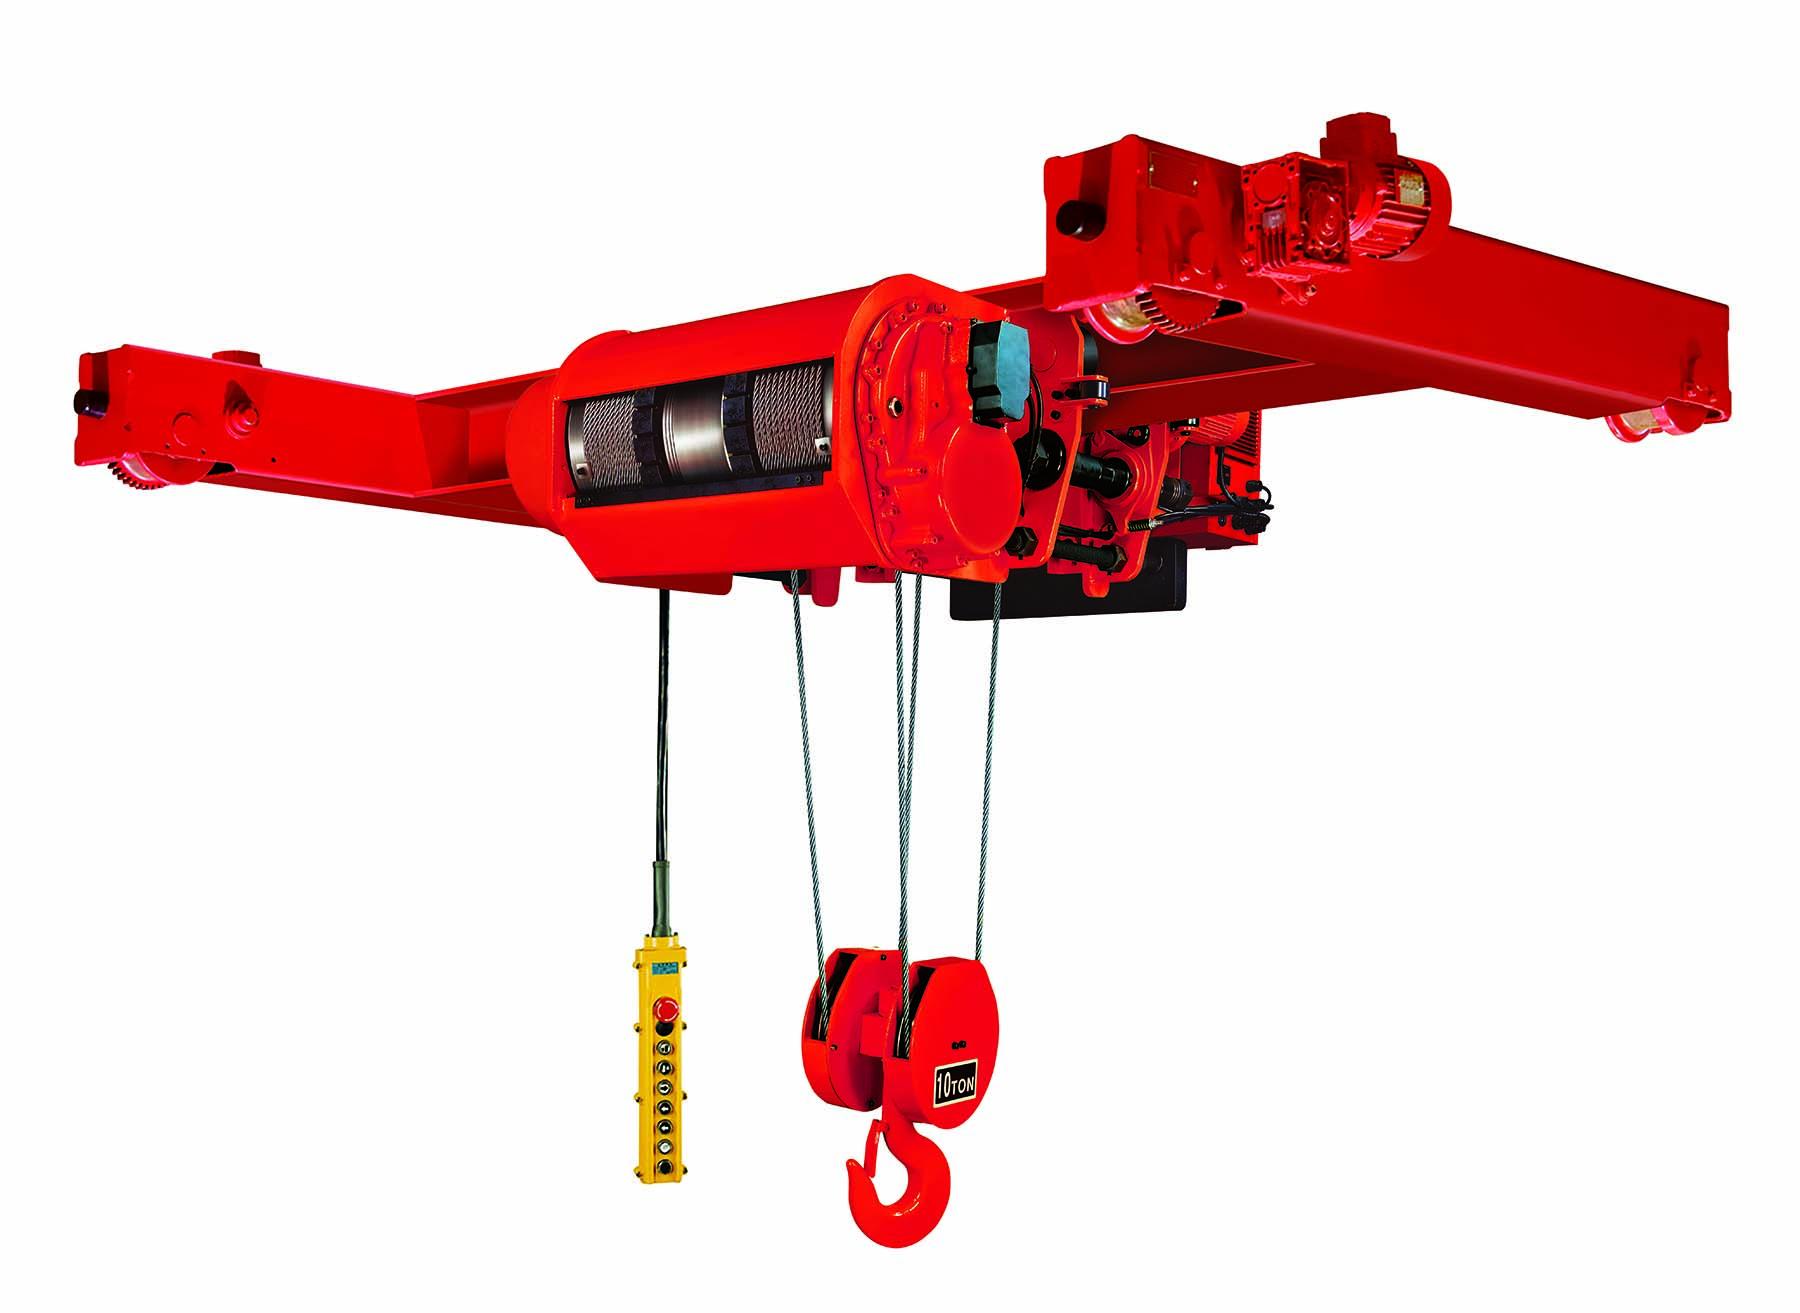 Overhead Crane Warning Horn : Ton single girder top running crane kit